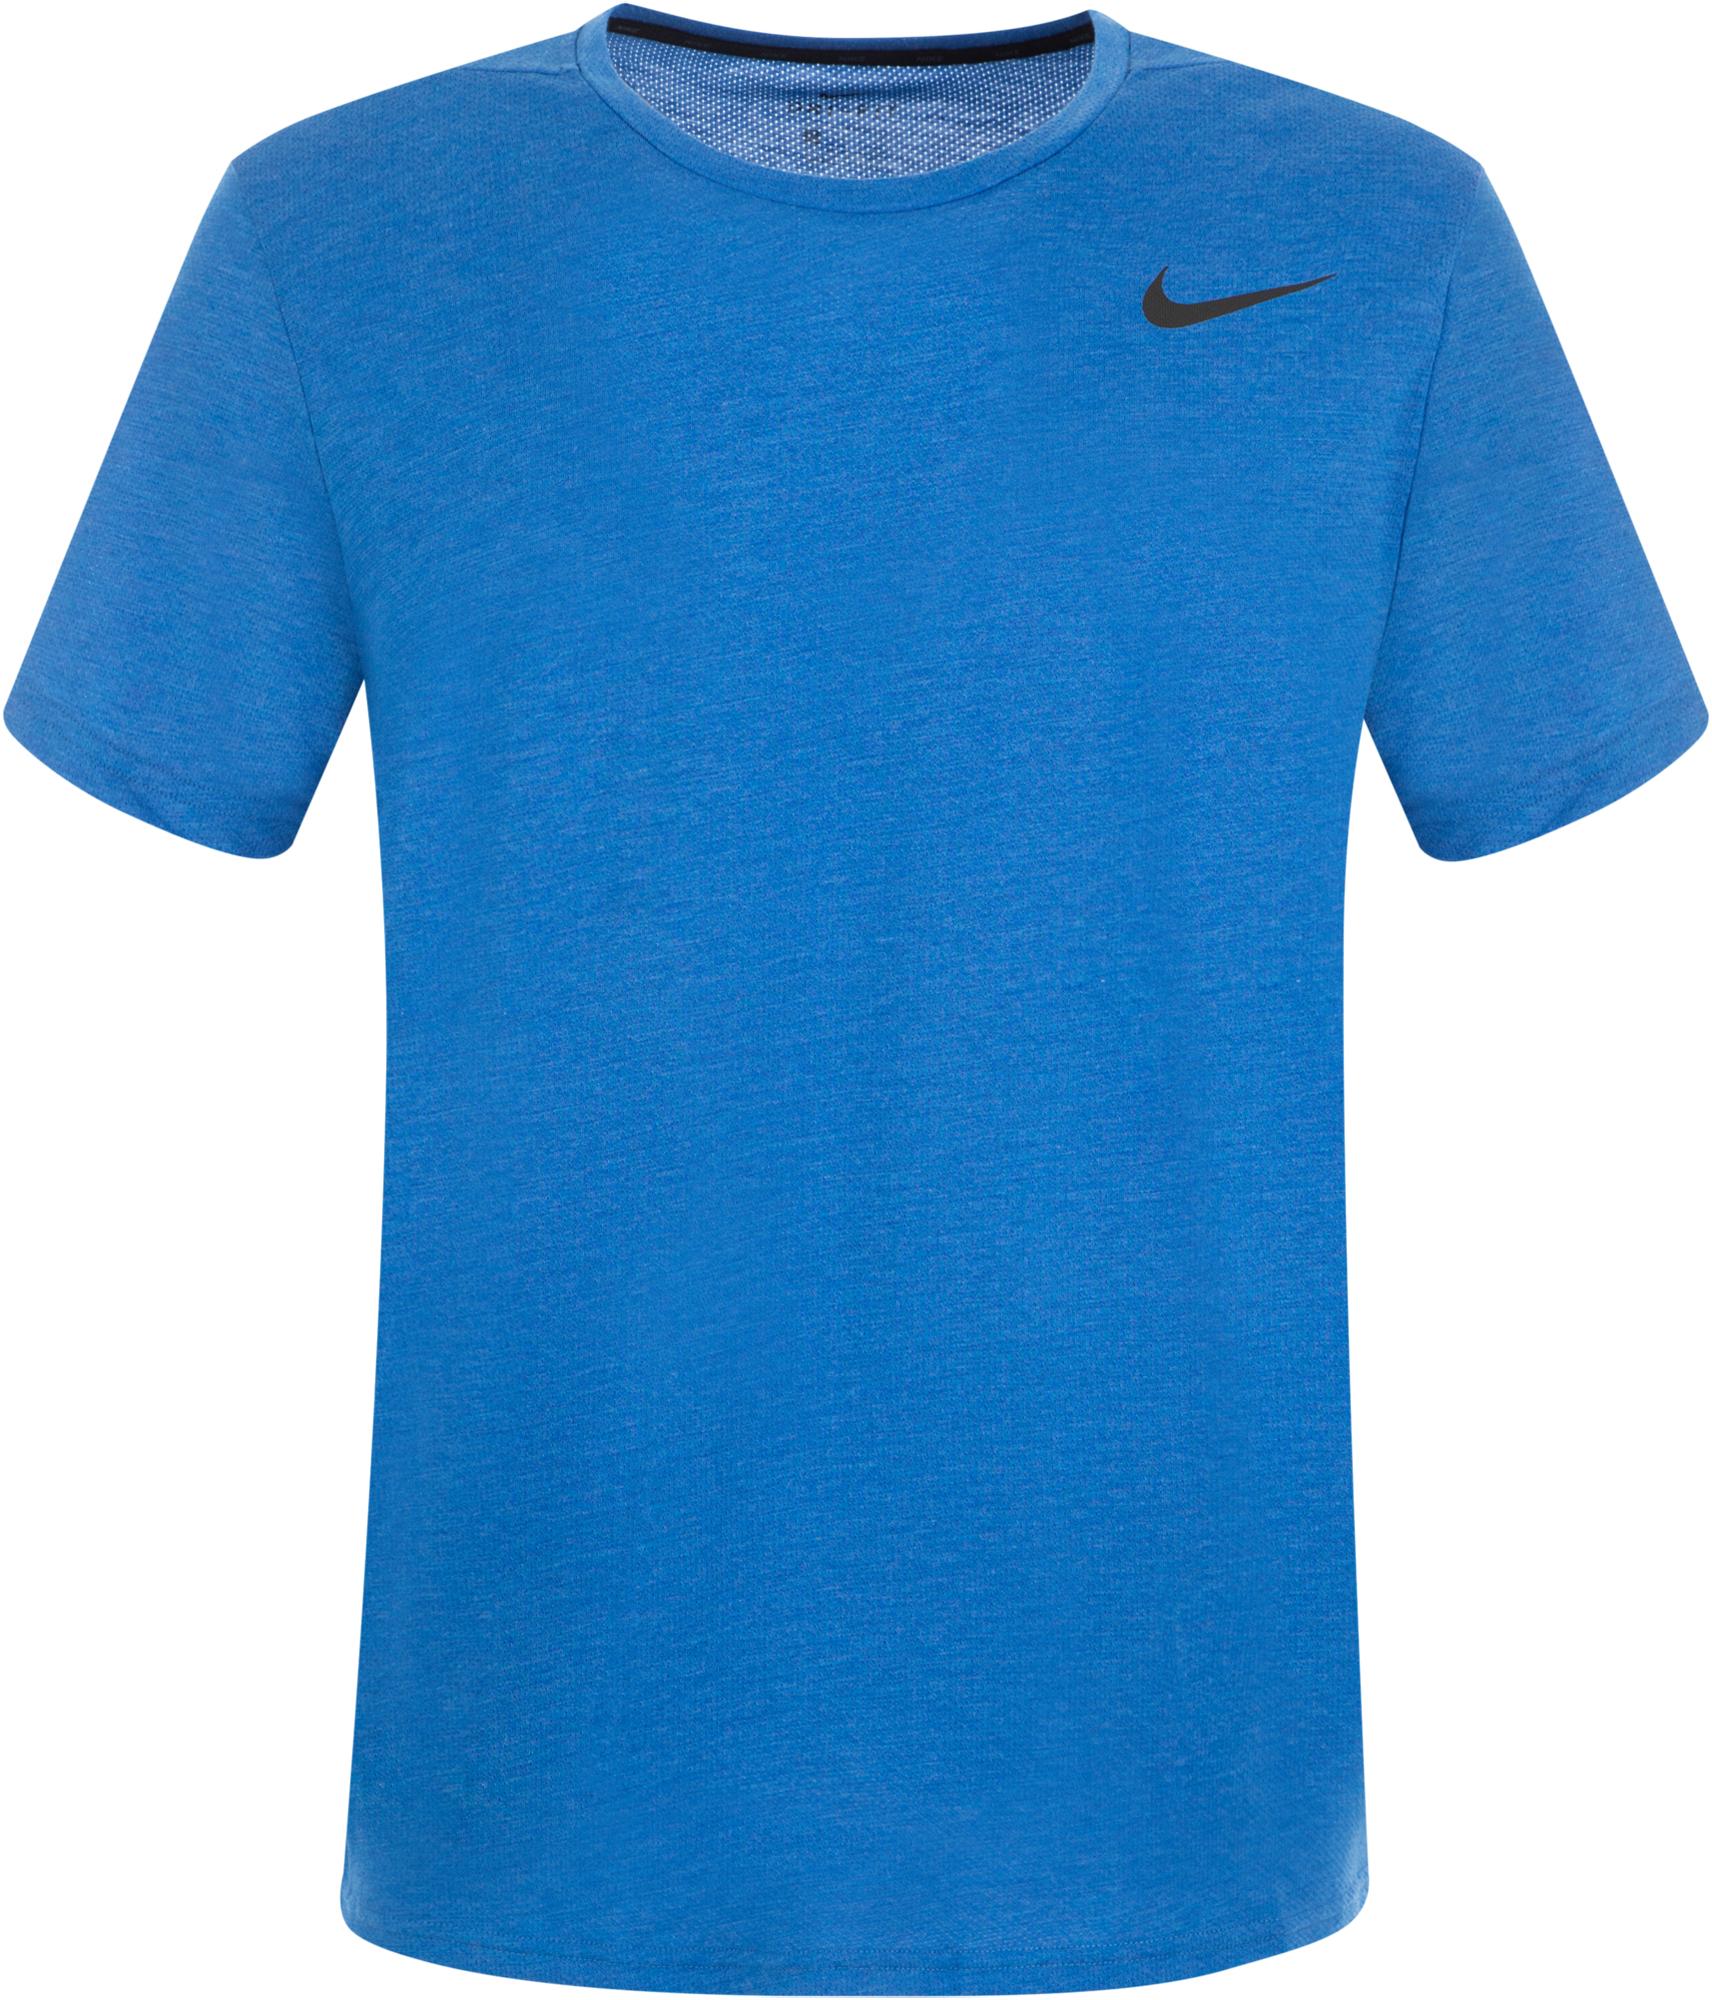 Nike Футболка мужская Nike Dri-FIT Breathe, размер 52-54 цена